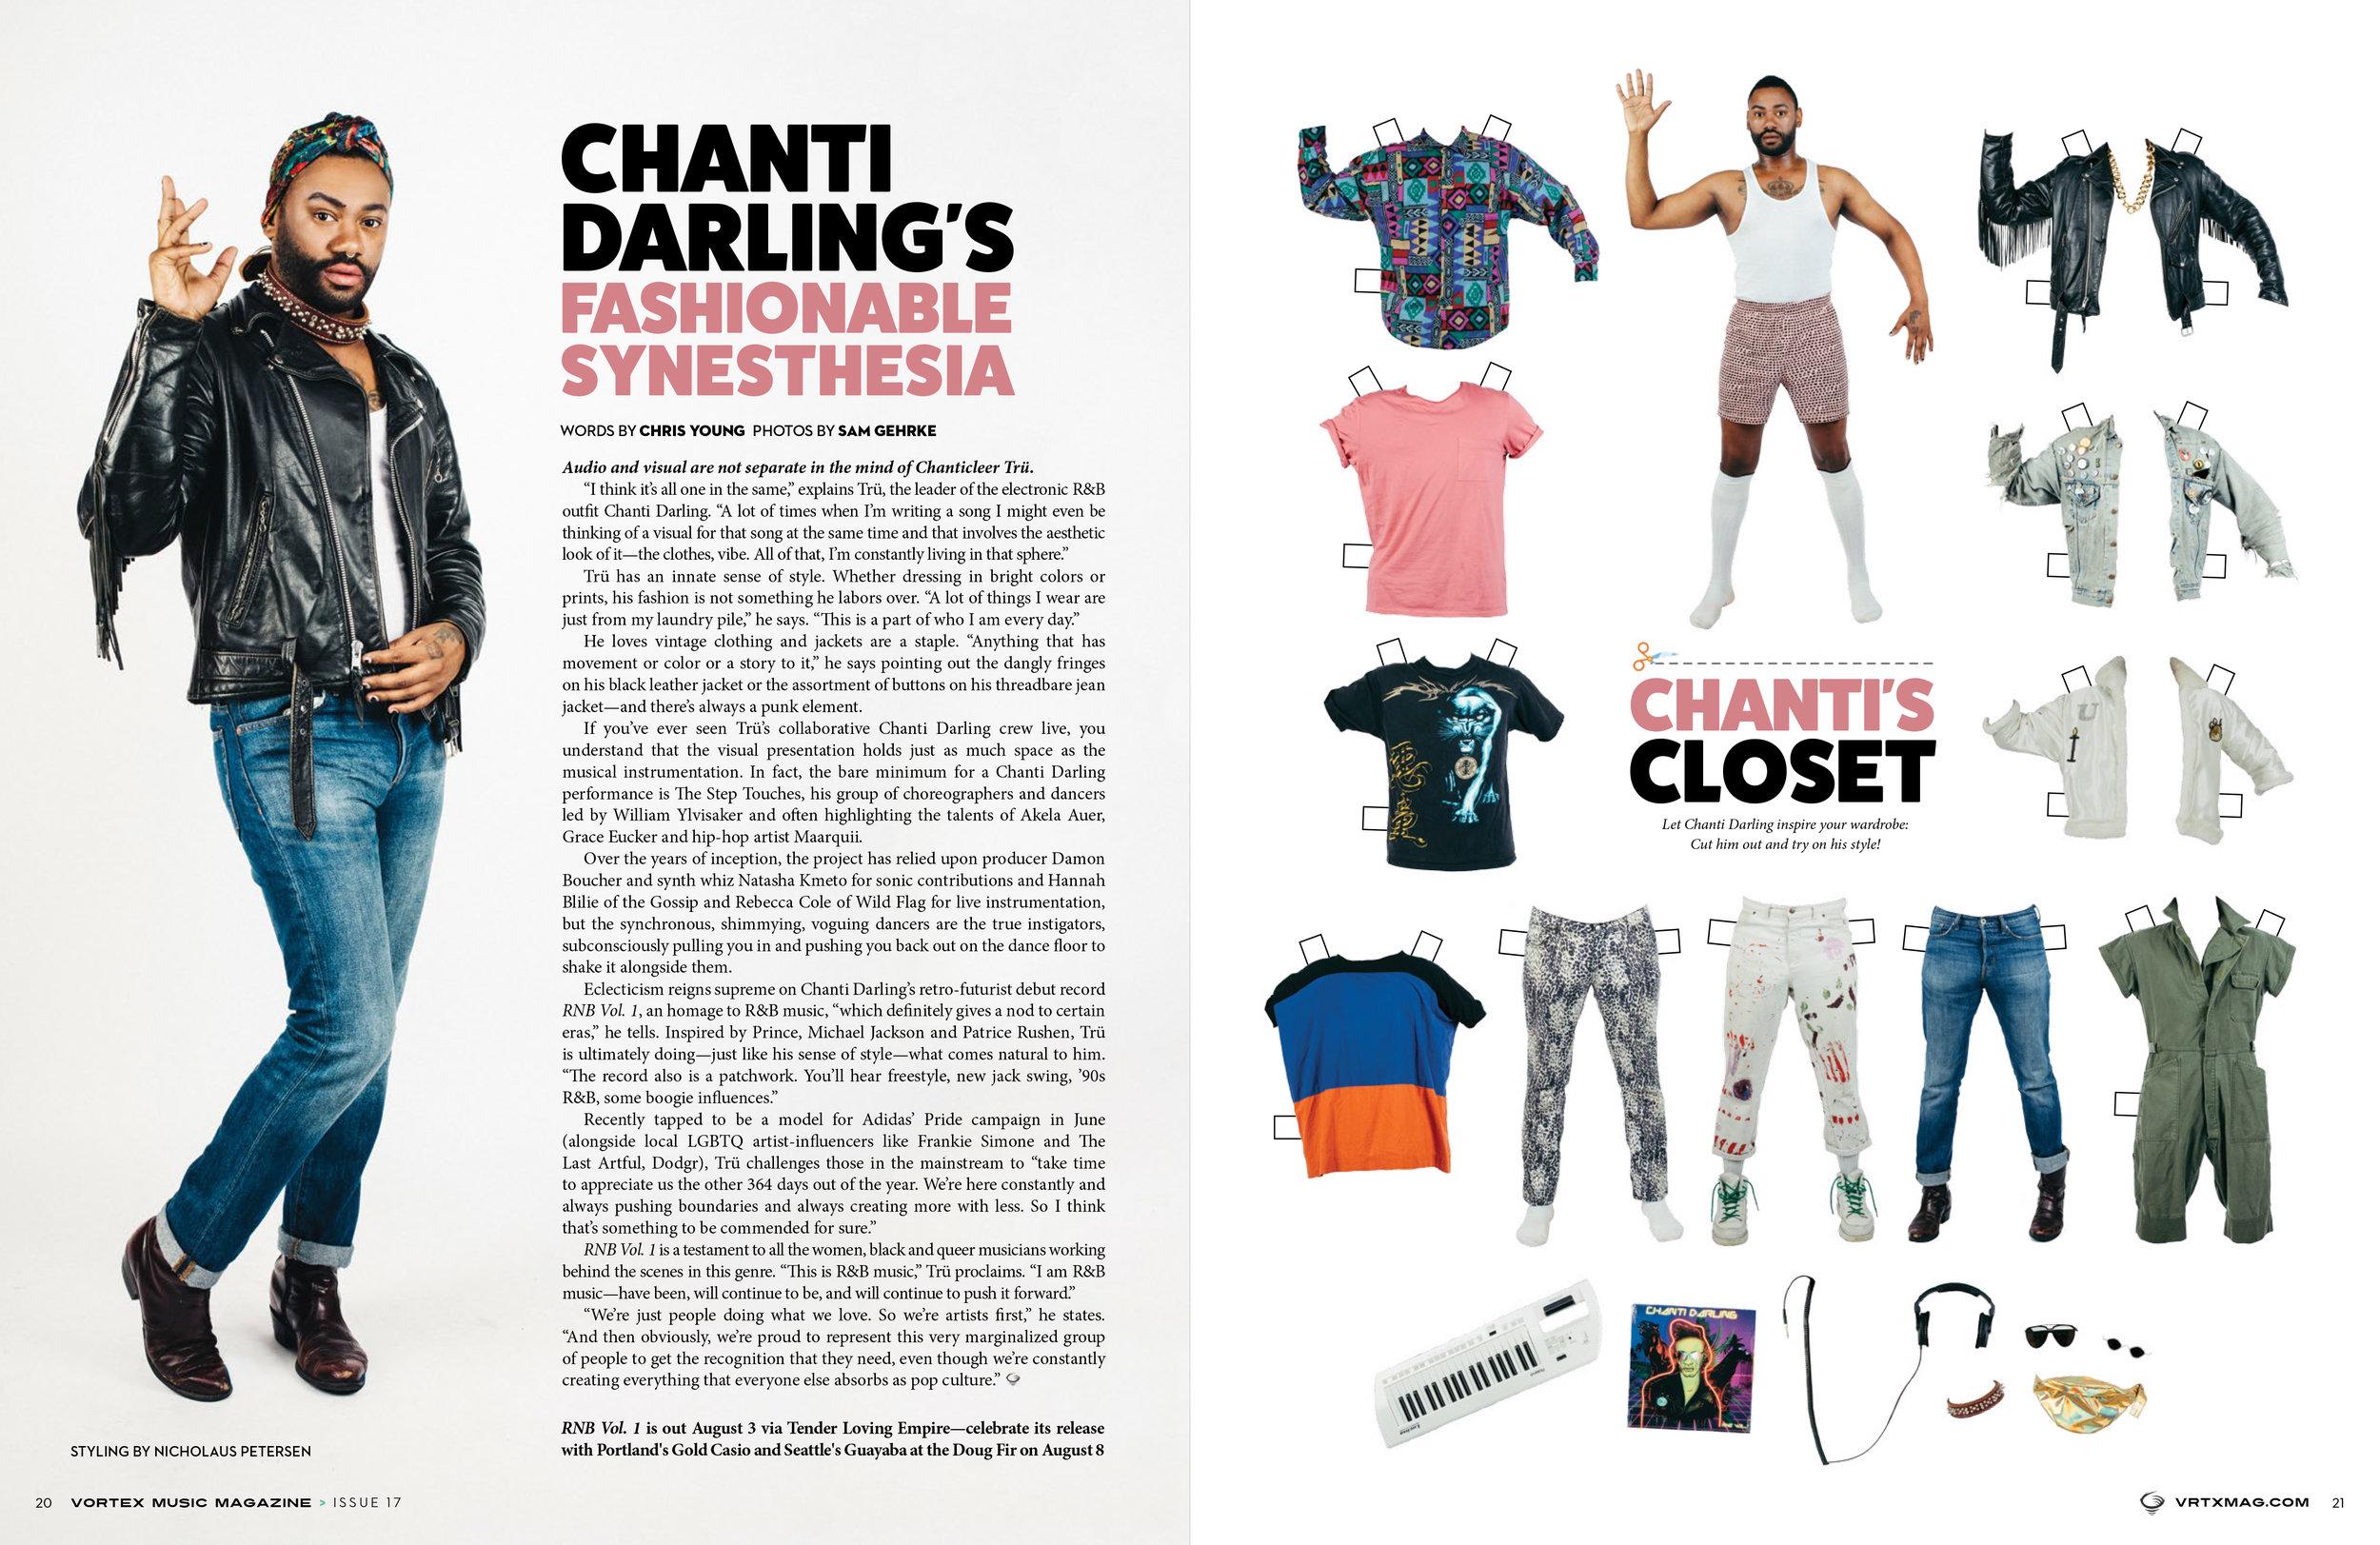 Chanti Darling for Vortex Music Magazine